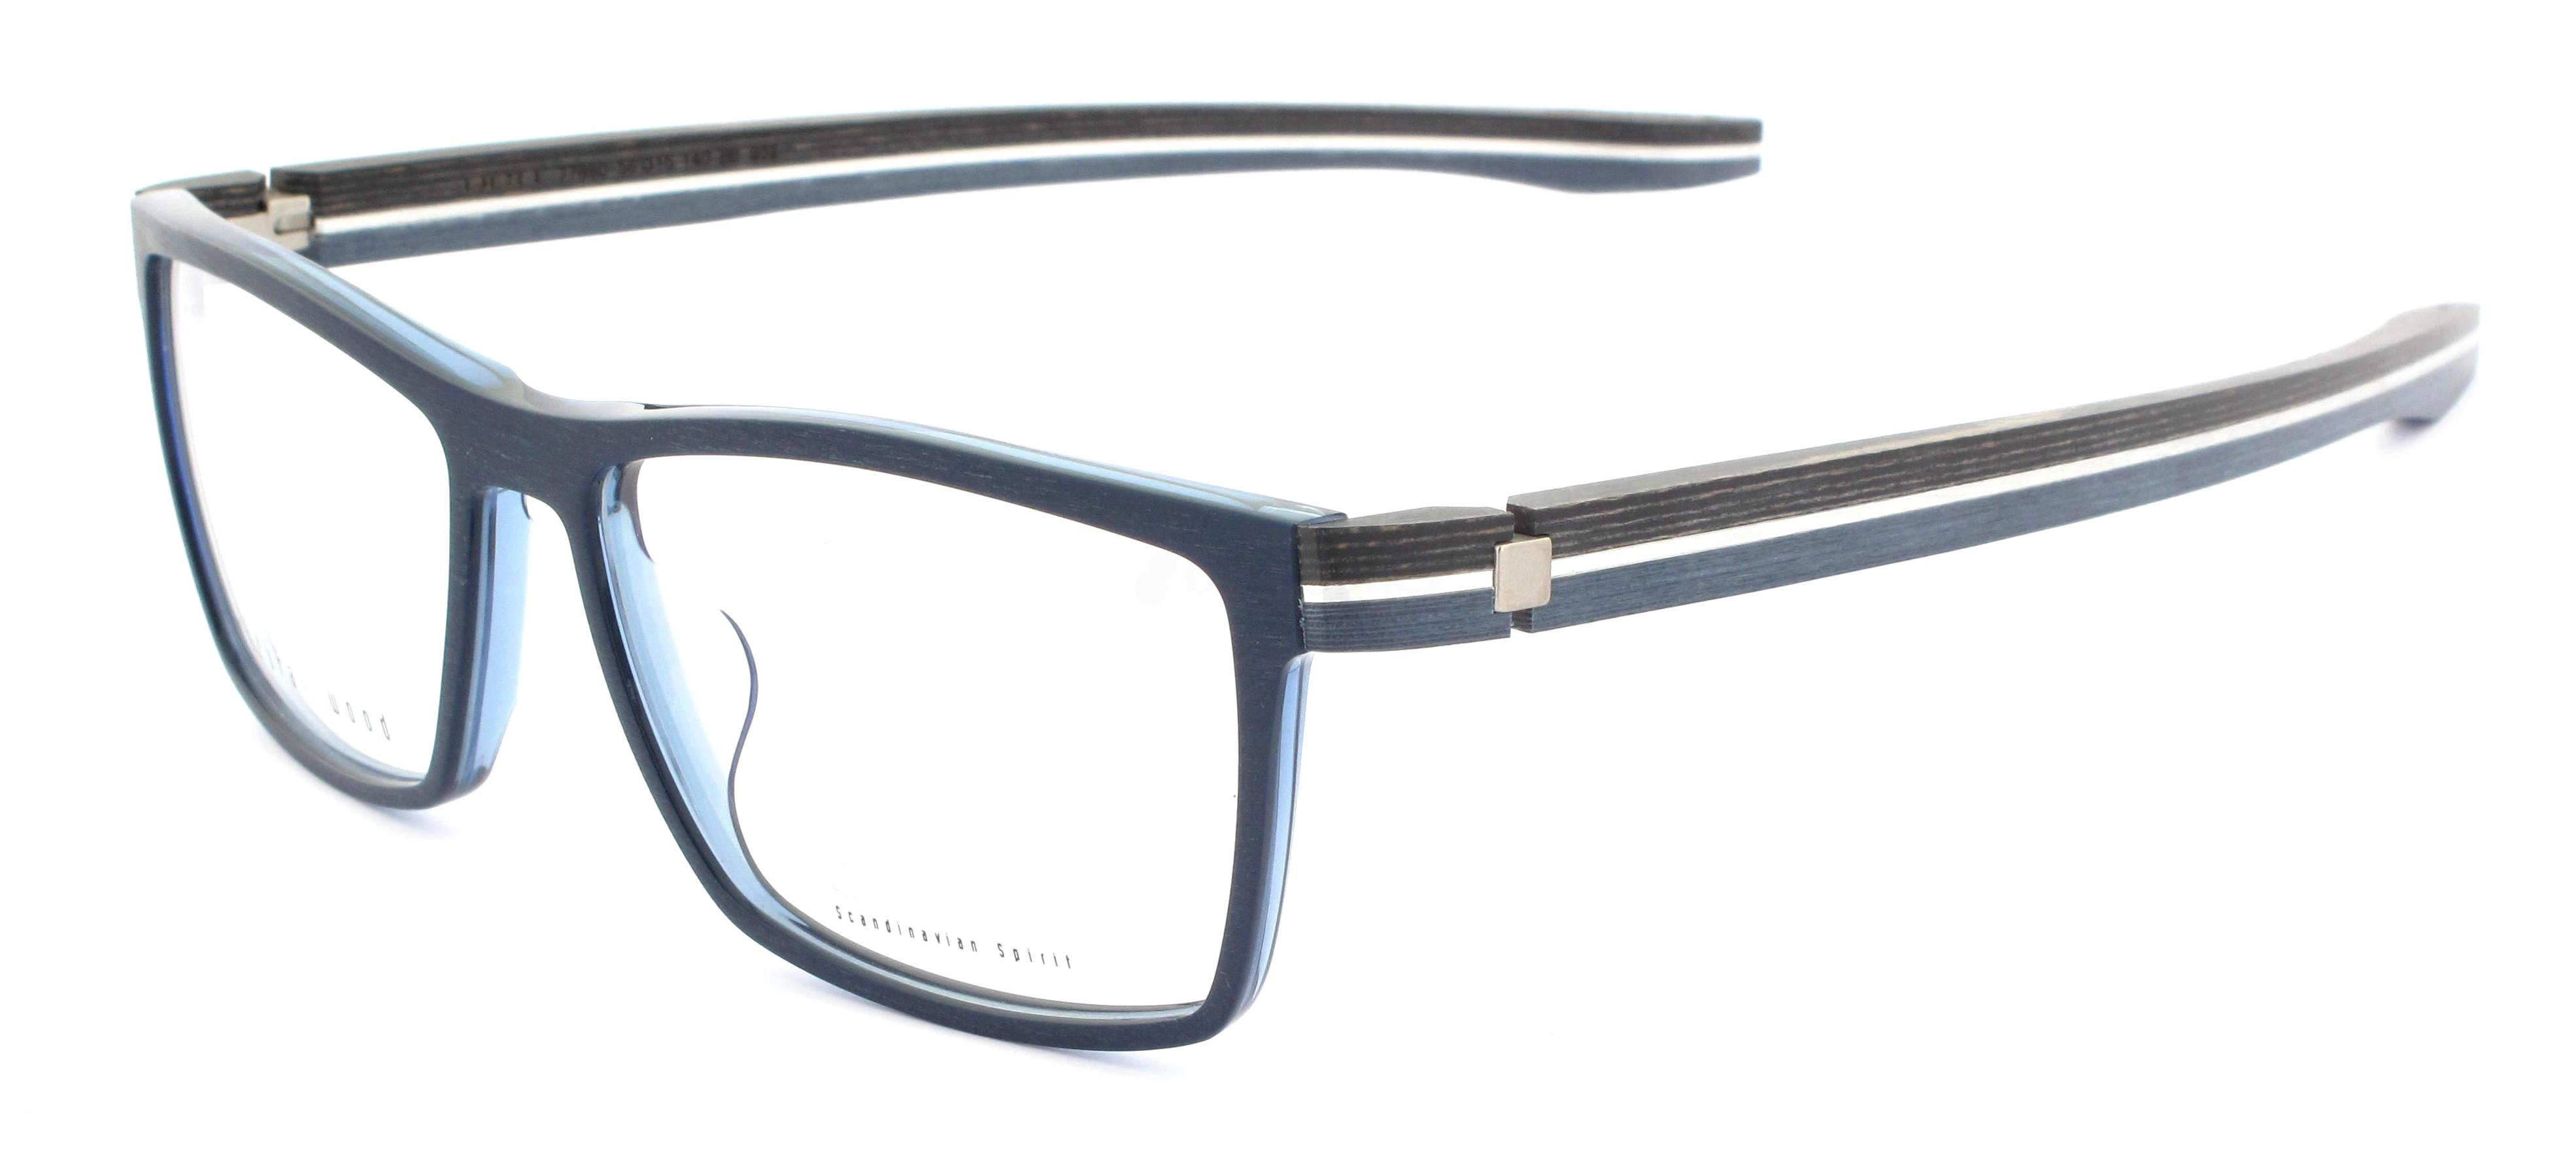 BB032 7789O PILTRA (WOOD) Glasses, ÖGA Scandinavian Spirit